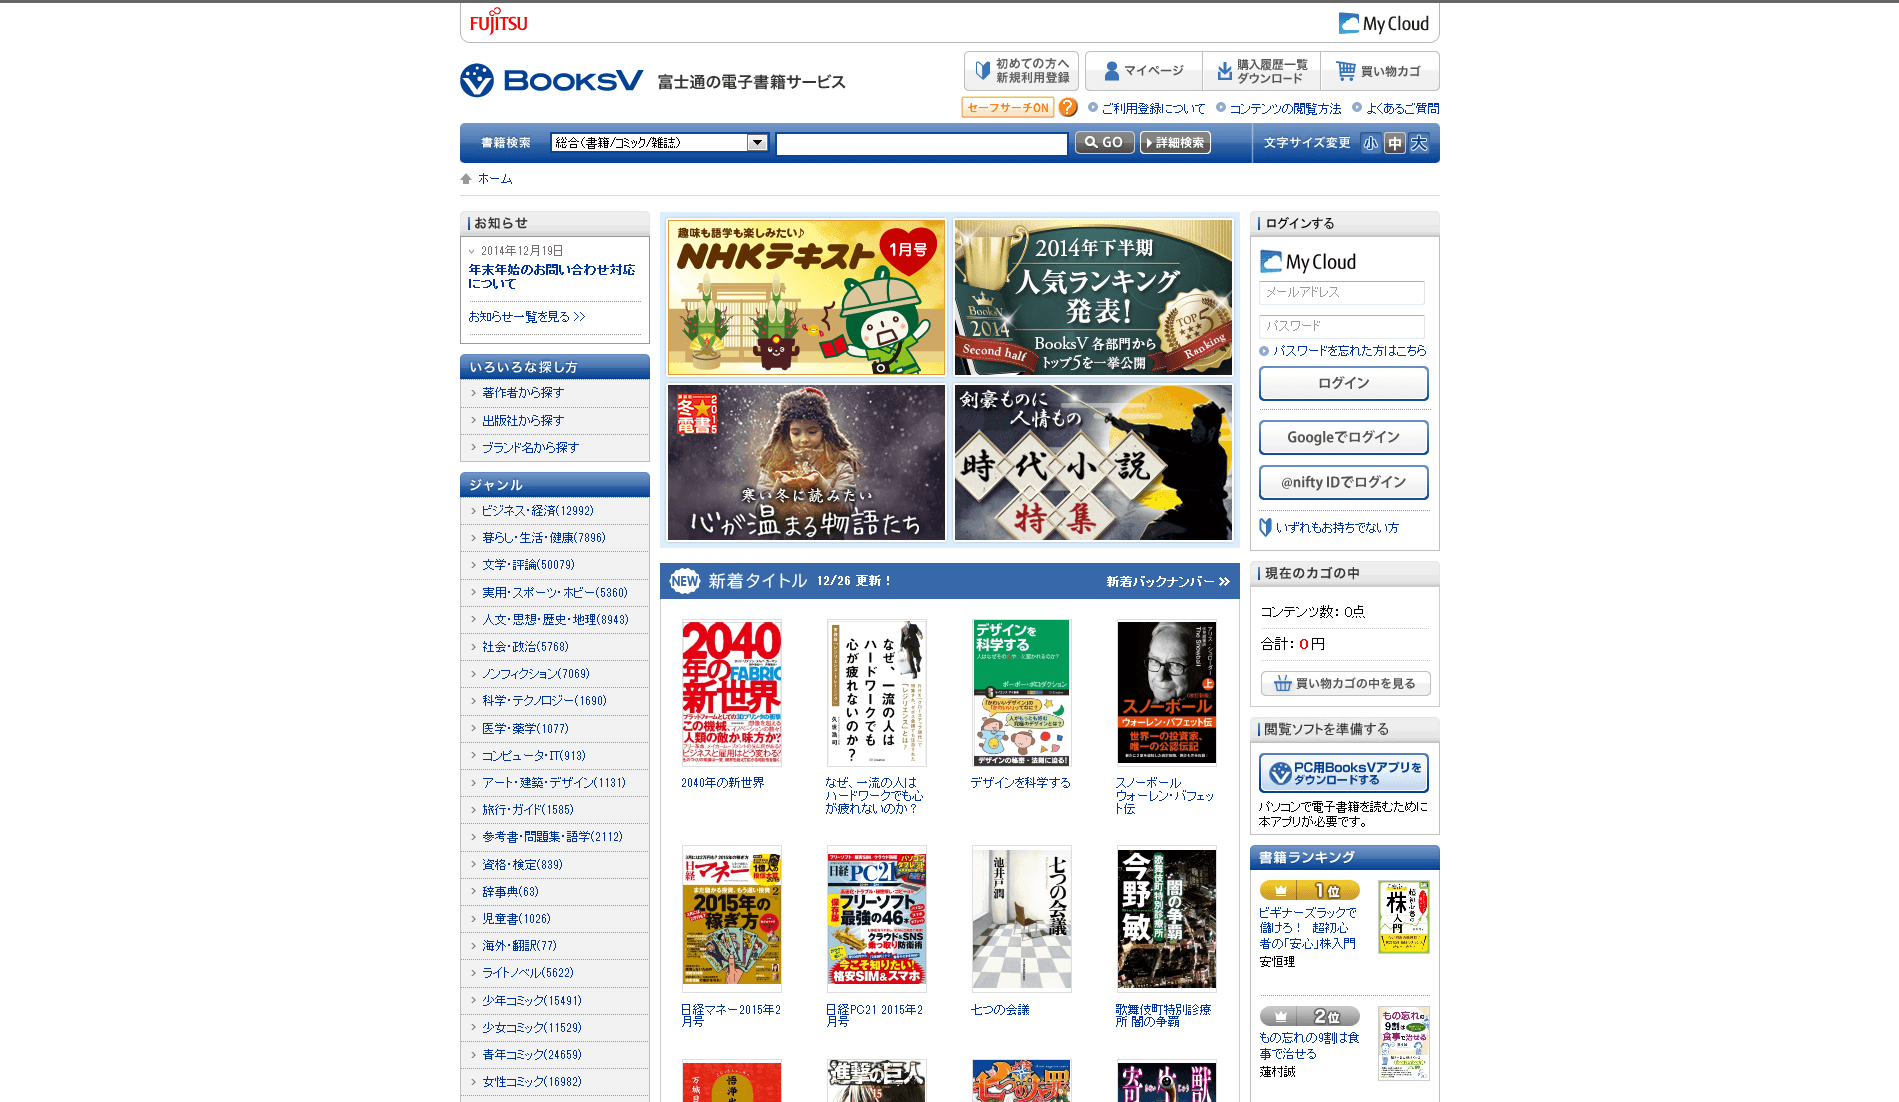 BooksV(ブックスブイ) 富士通の電子書籍サービス